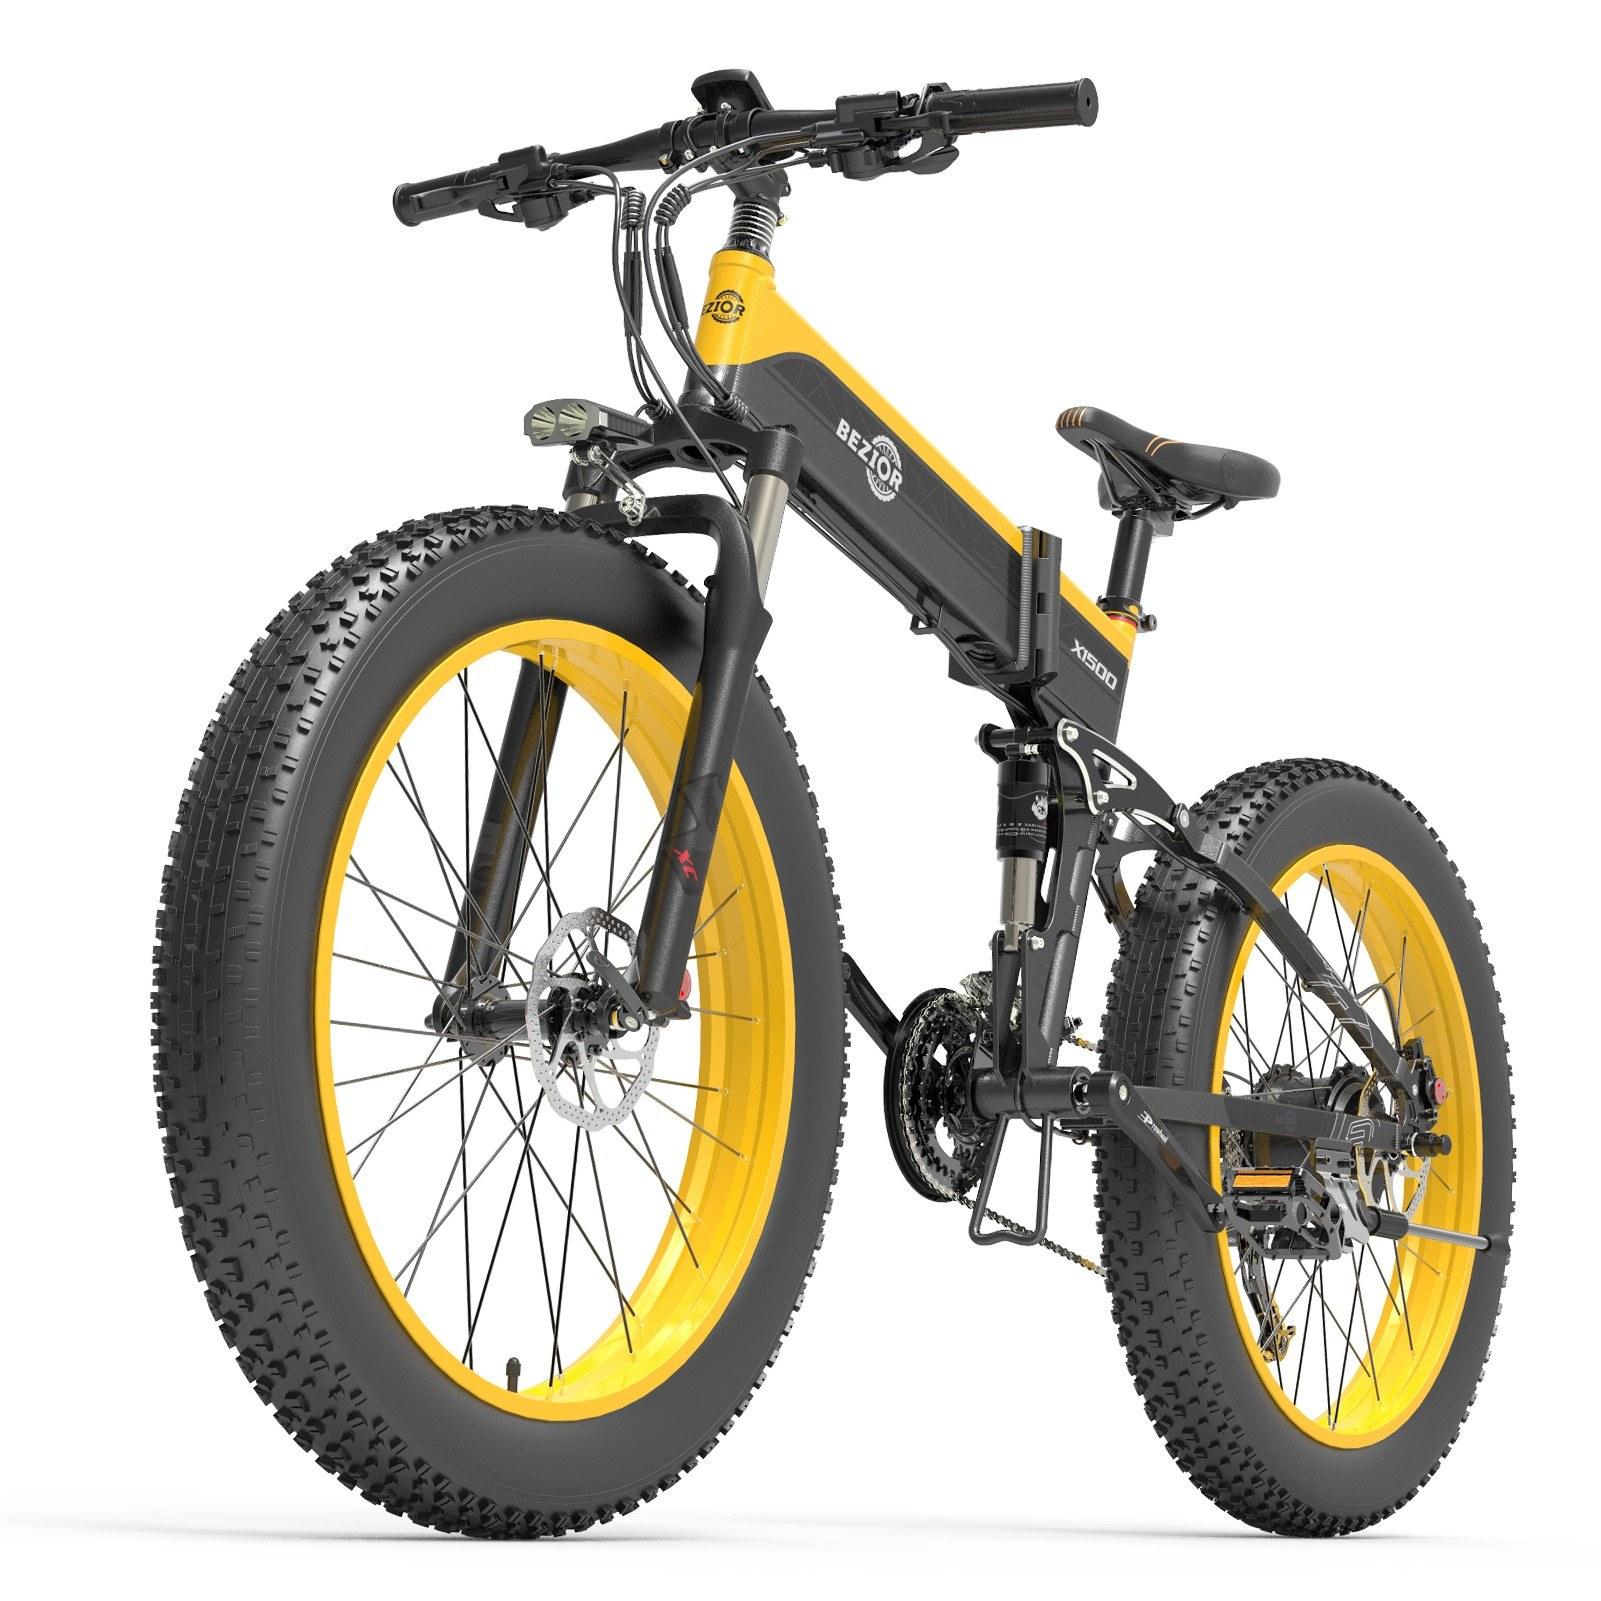 Tomtop - [EU Warehouse]$658 OFF BEZIOR X1500 1500W 26Inch Folding Electric Bike 48V 12.8AH, $1529.40 Inclusive of VAT